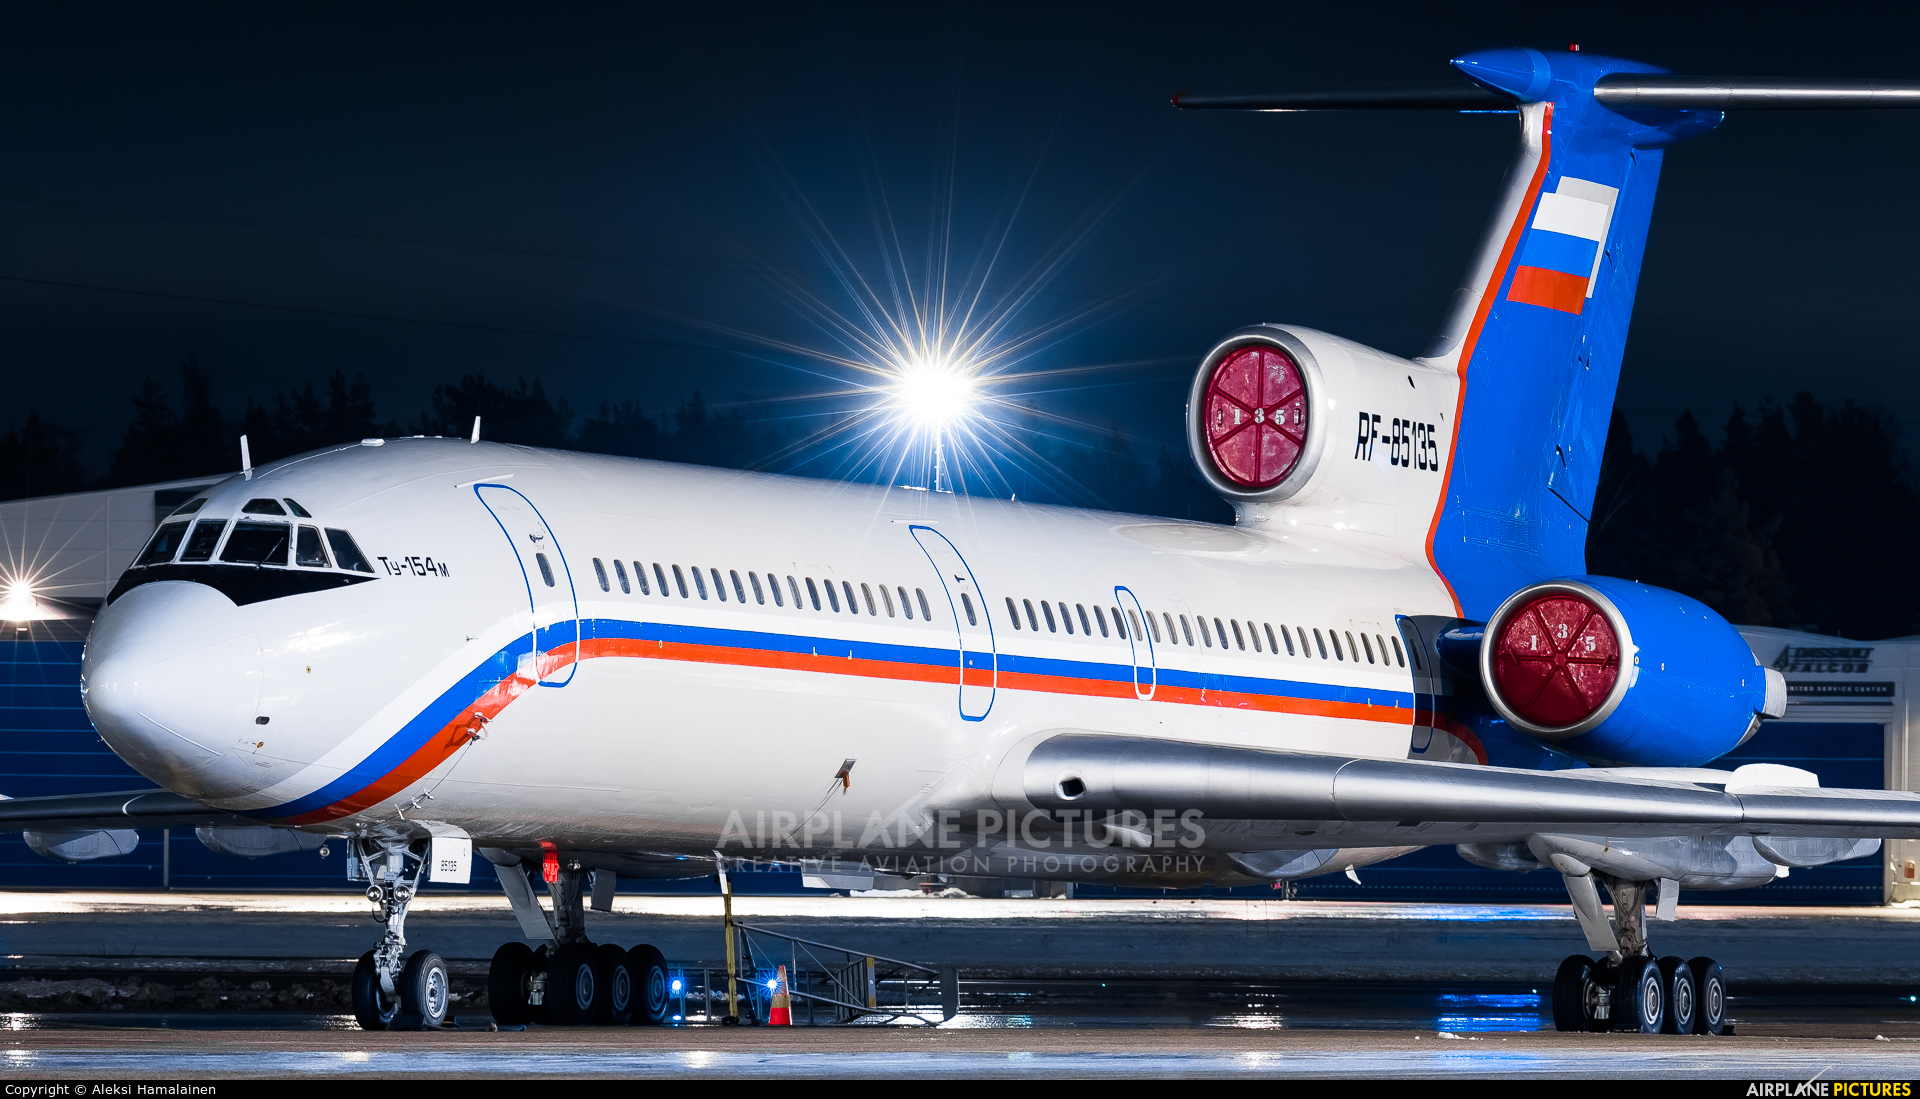 Russia - Ministry of Internal Affairs RF-85135 aircraft at Helsinki - Vantaa